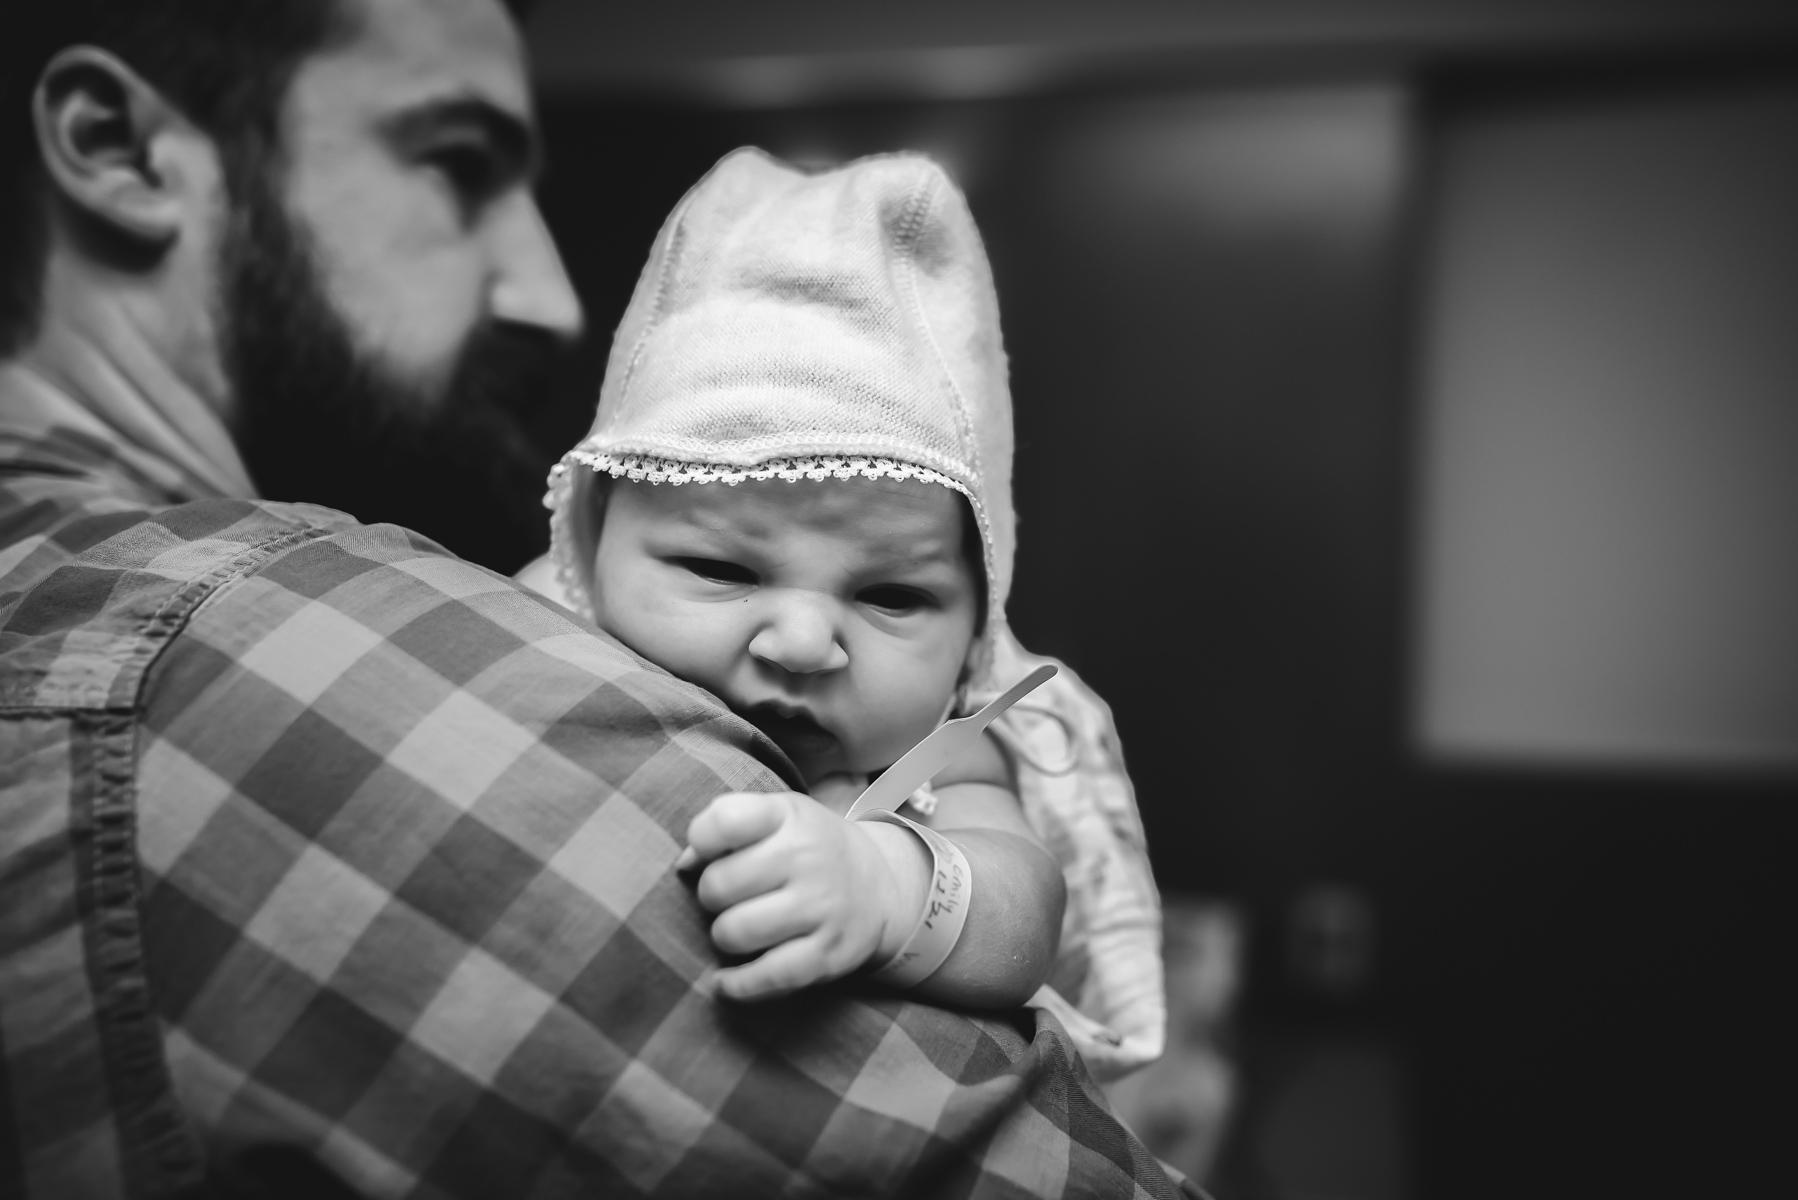 denver-cesarean-birth-photography-dad-holds